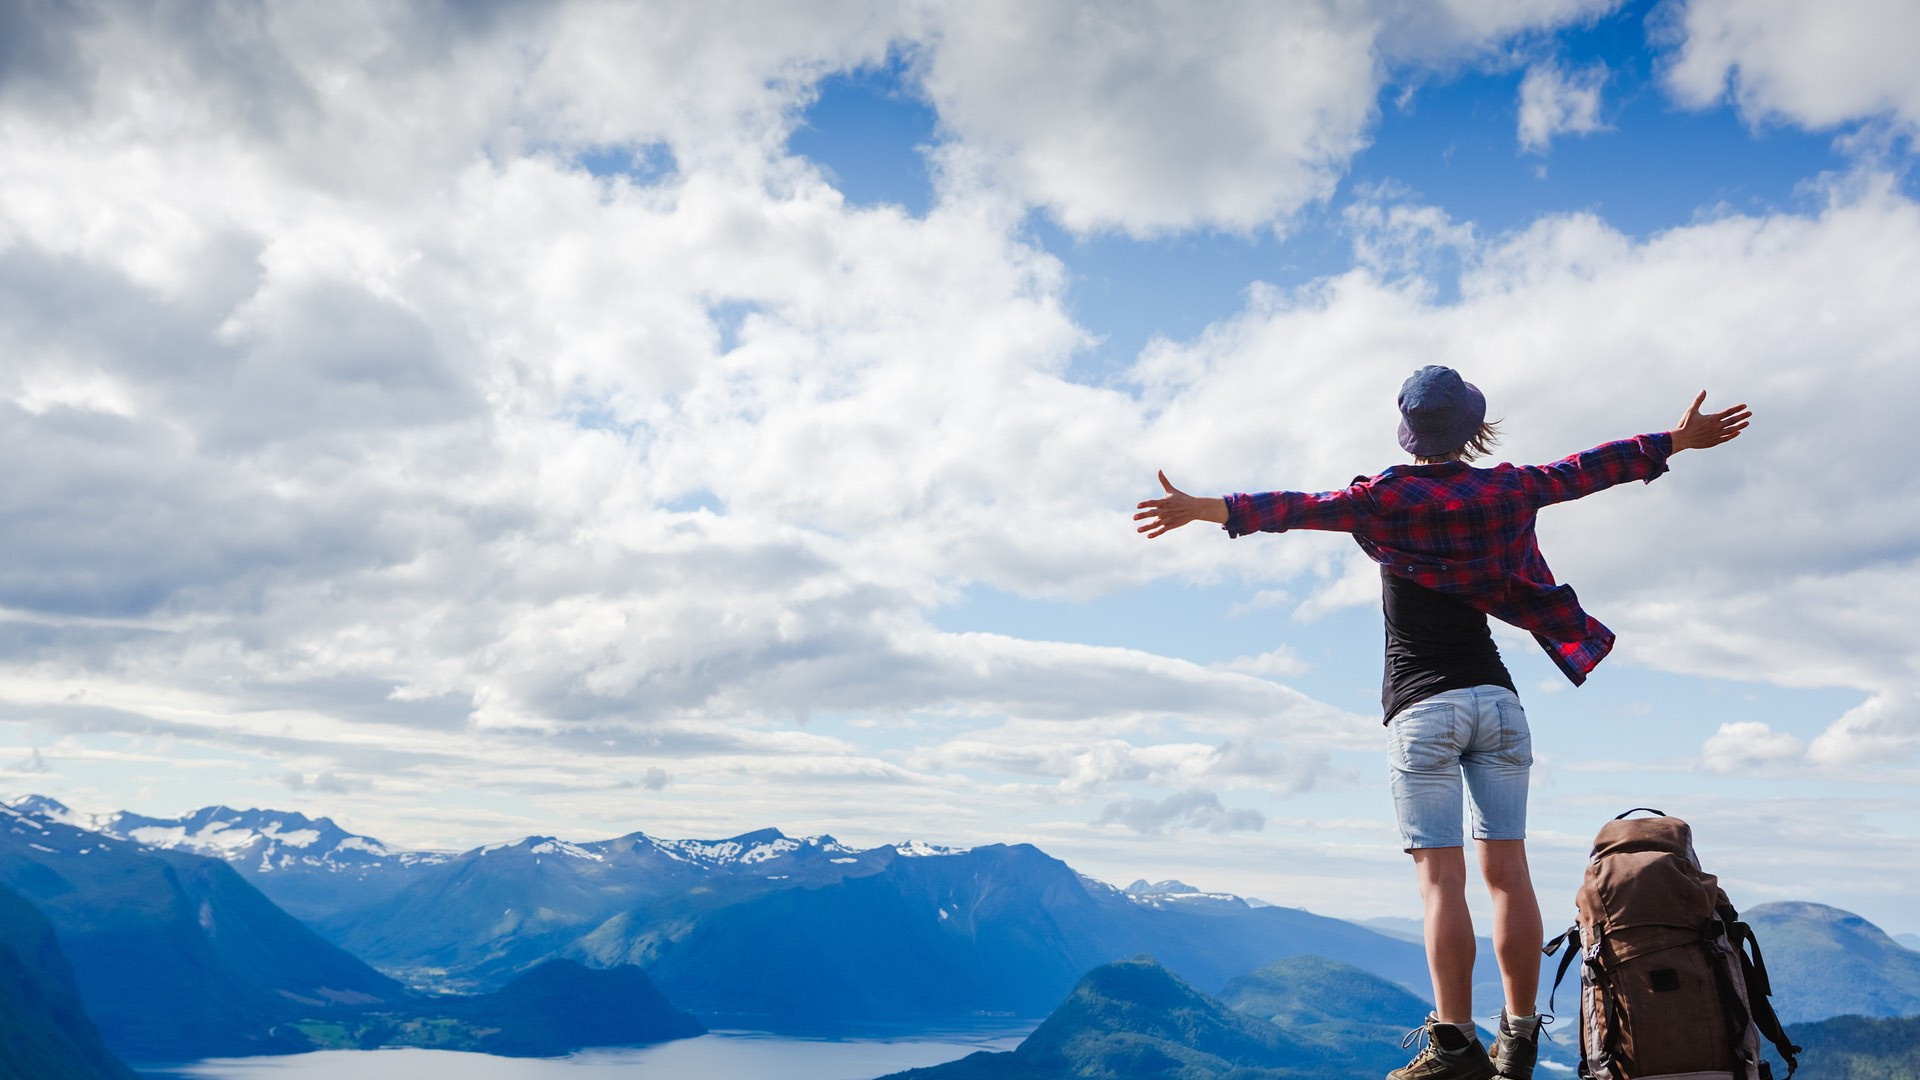 Glückliche Bergsteigerin | ©Olga Danylenko/Shutterstock.com